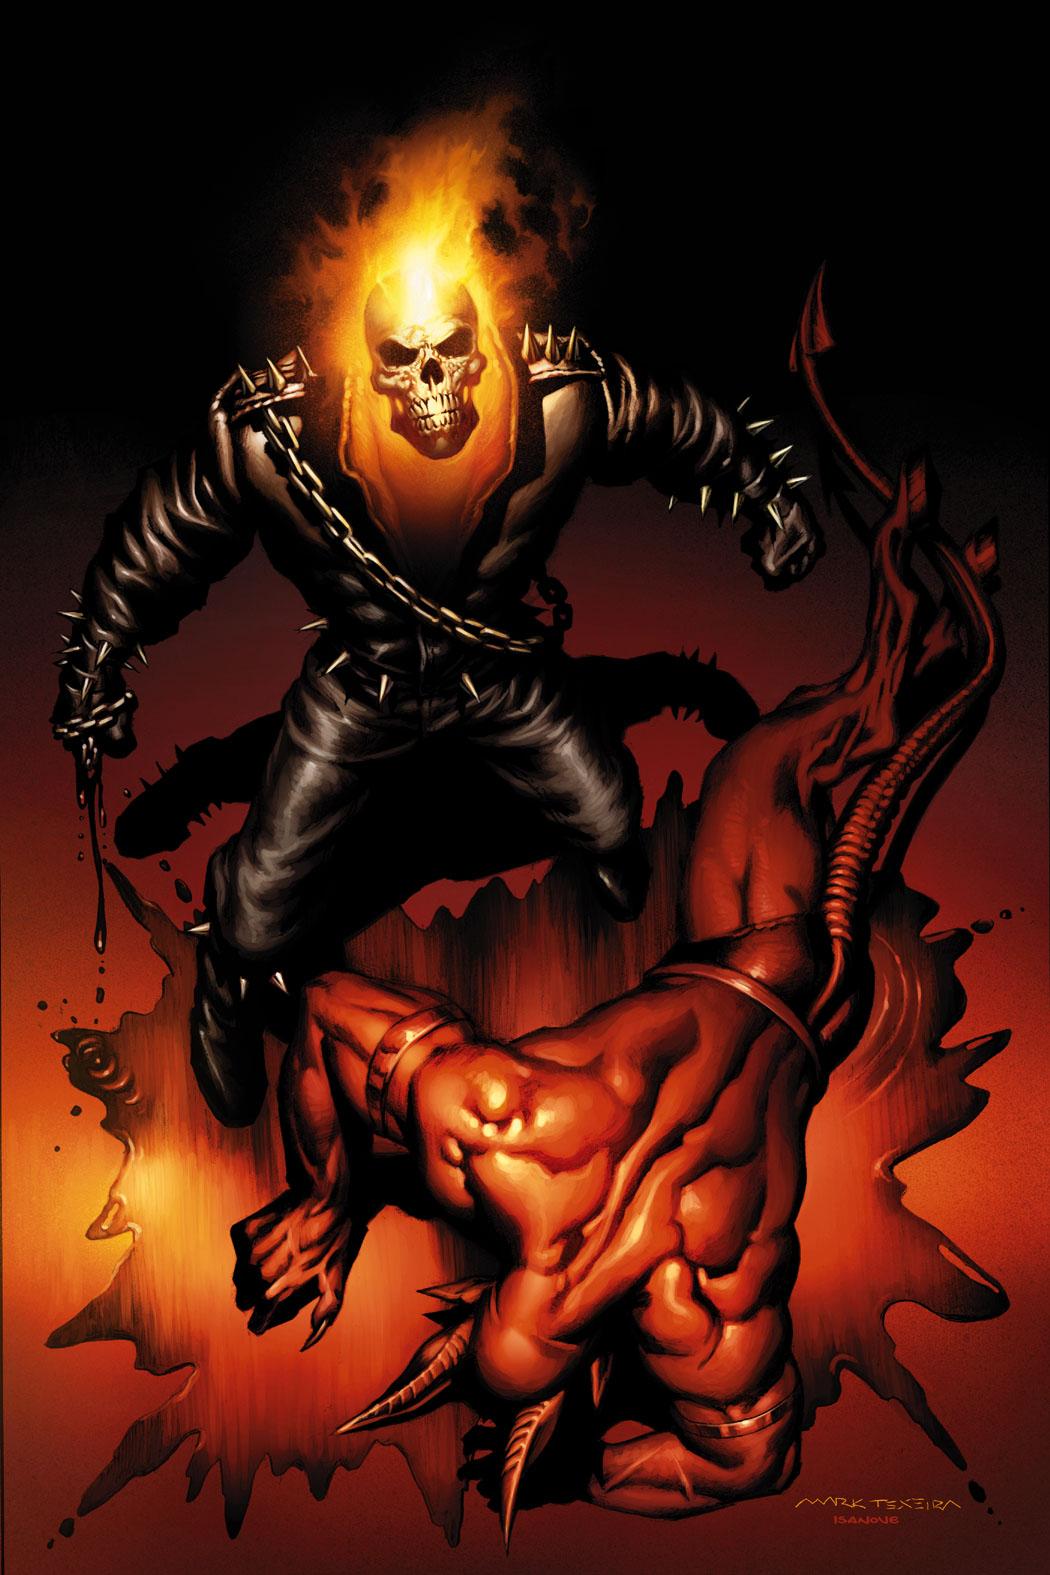 ... Mack: Ghost Rider 2 Spirit of Vengeance - Coming Soon /w HD Trailer